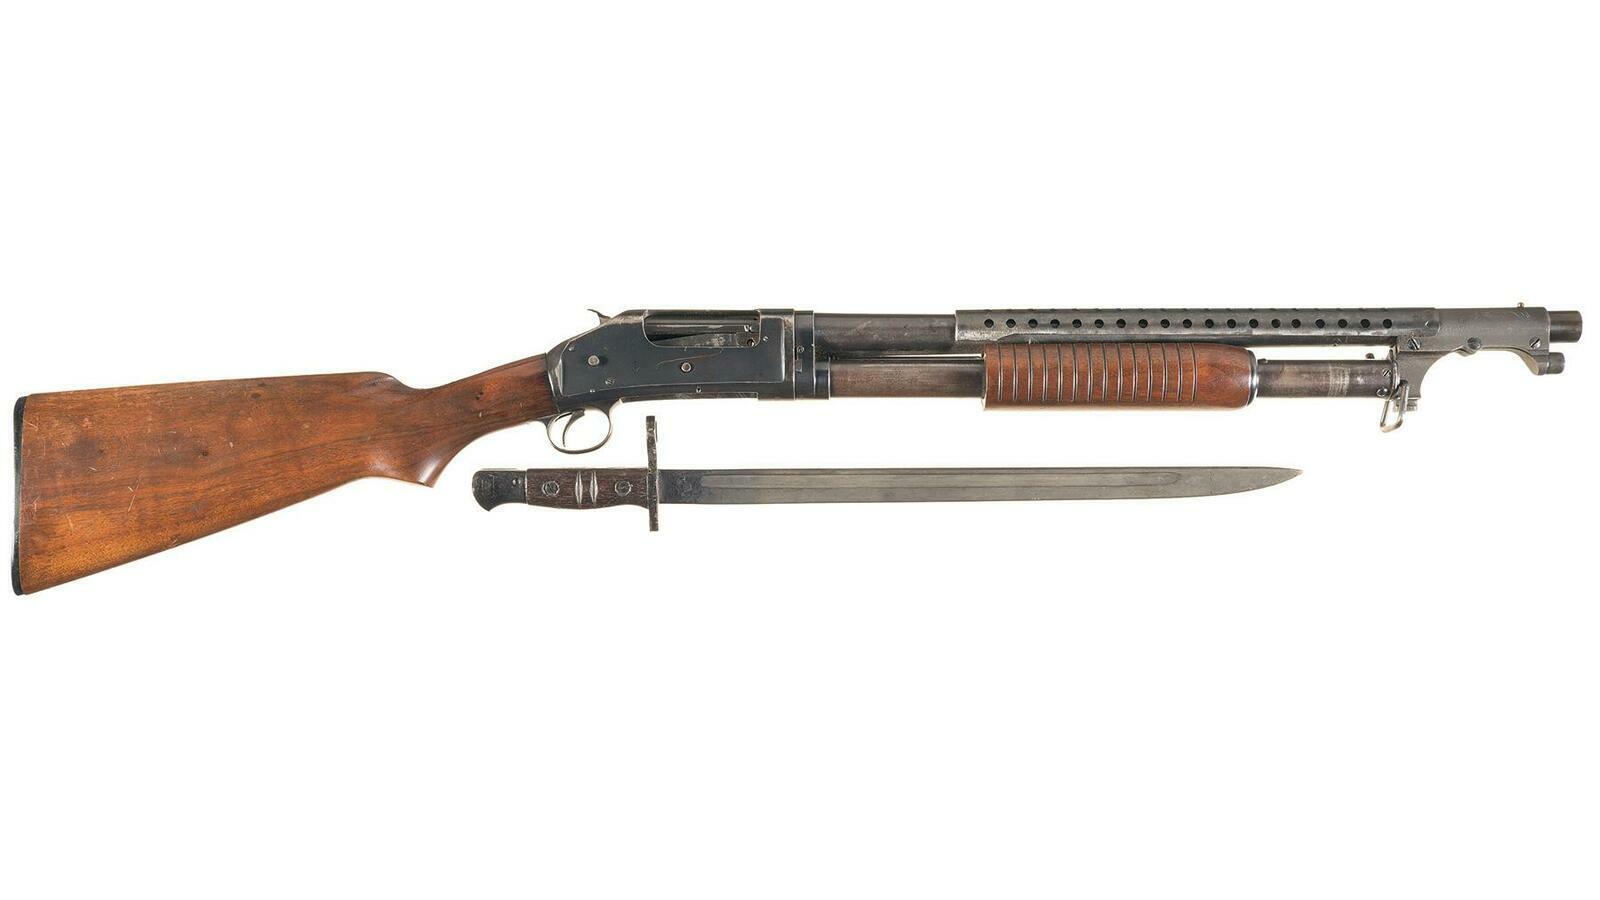 Winchester Model 97 Takedown Trench Shotgun w/Bayonet